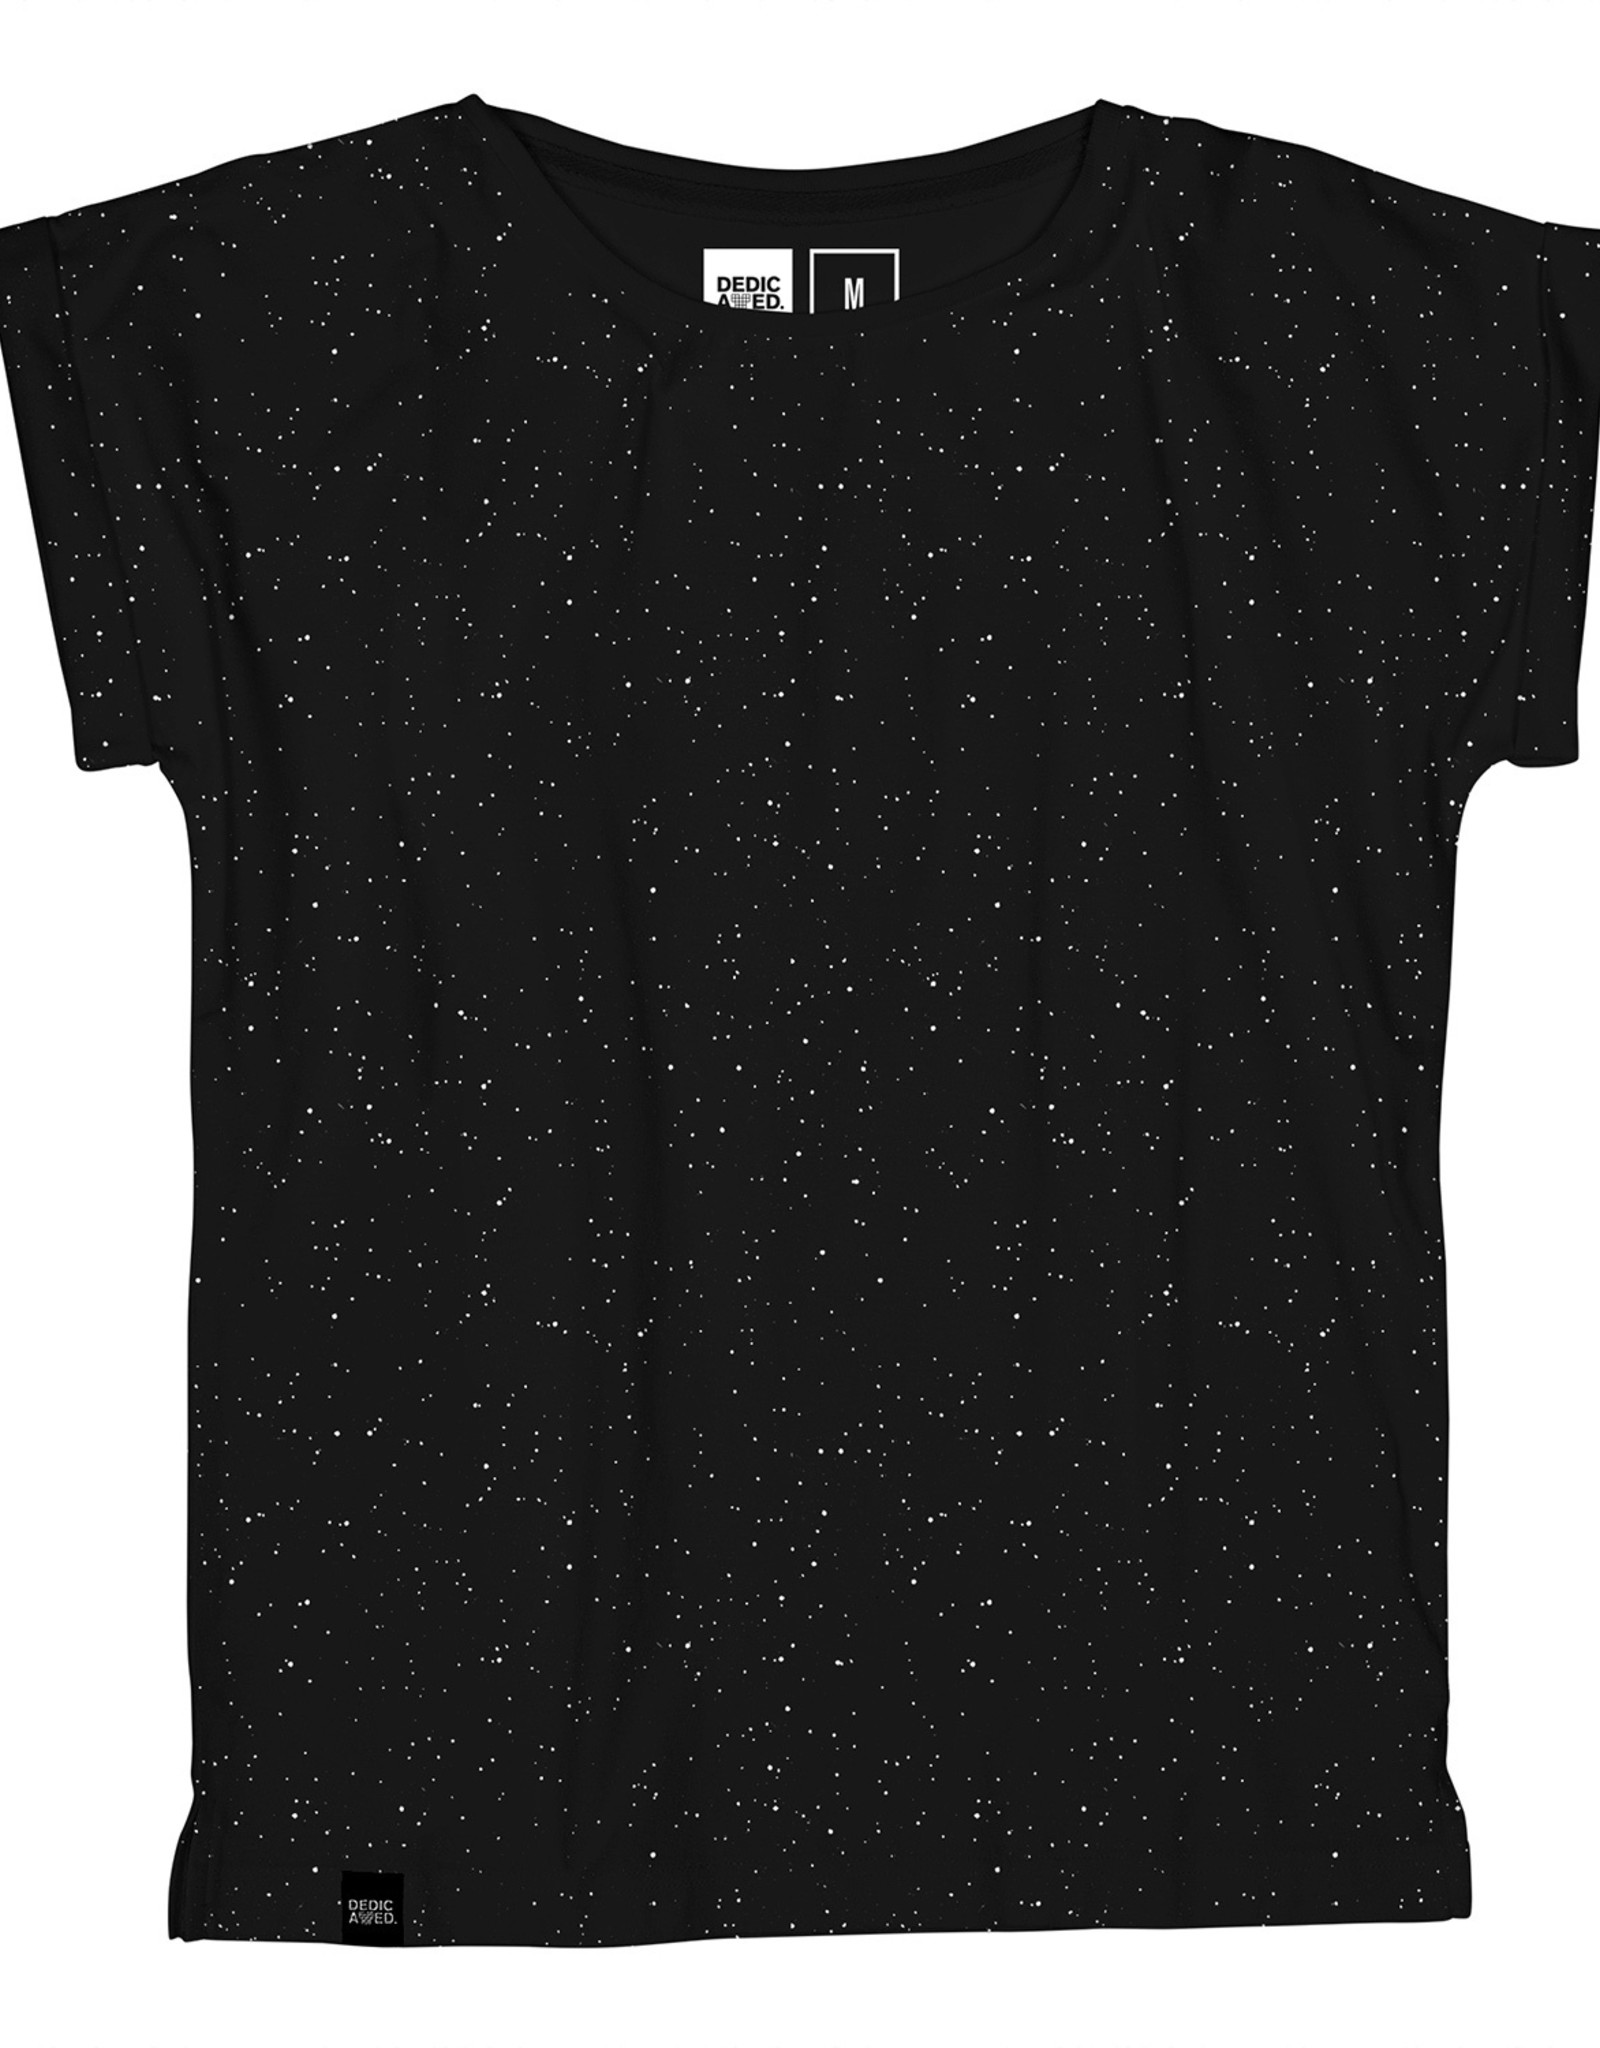 Dedicated T-SHIRT SPACE PRINT BLACK